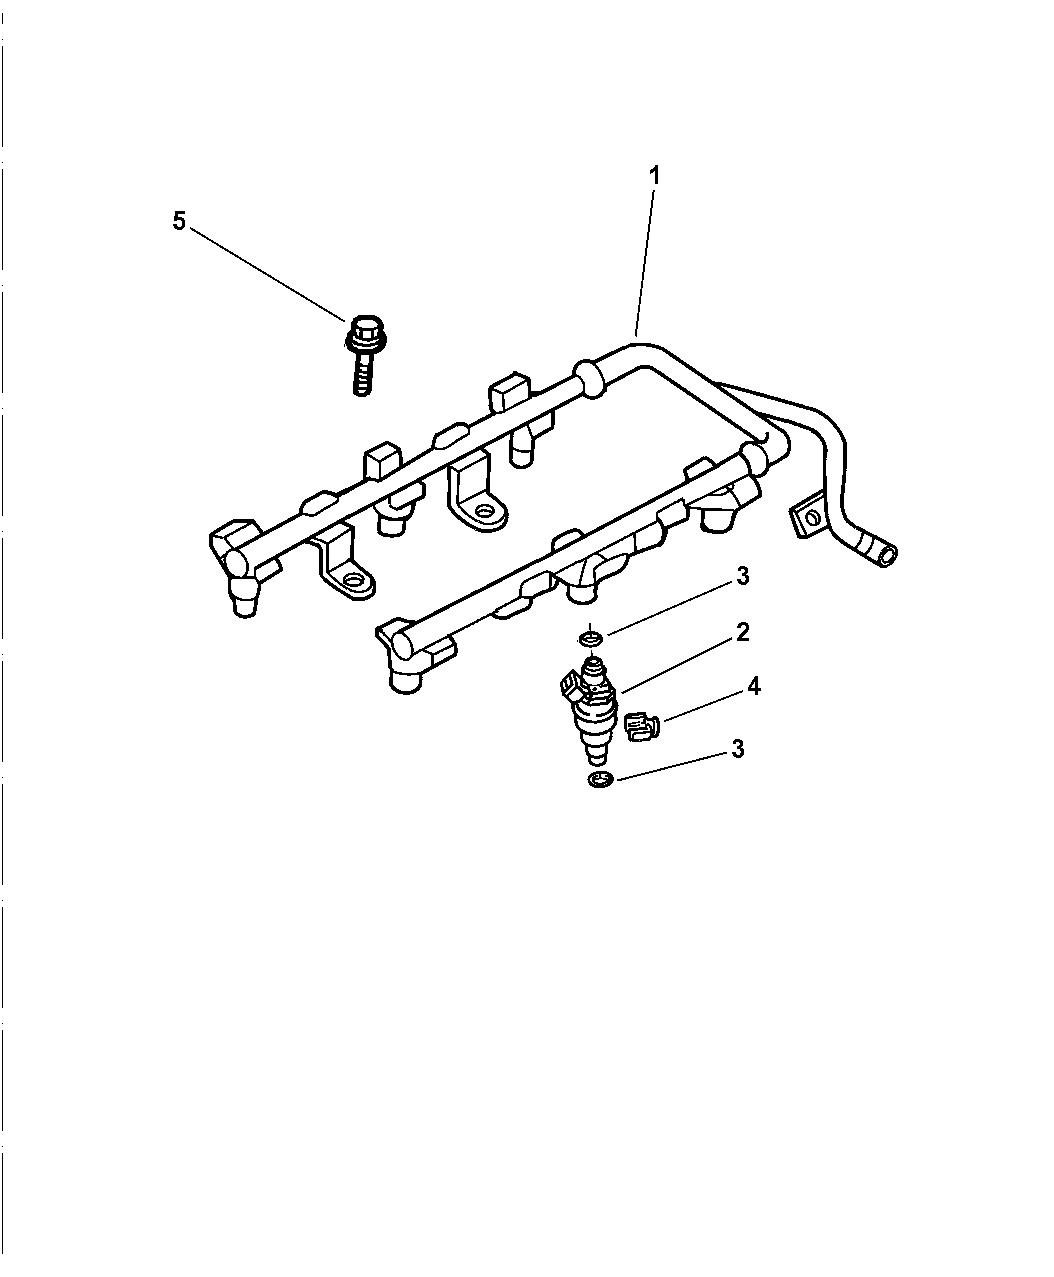 1999 Dodge Intrepid Fuel Rail